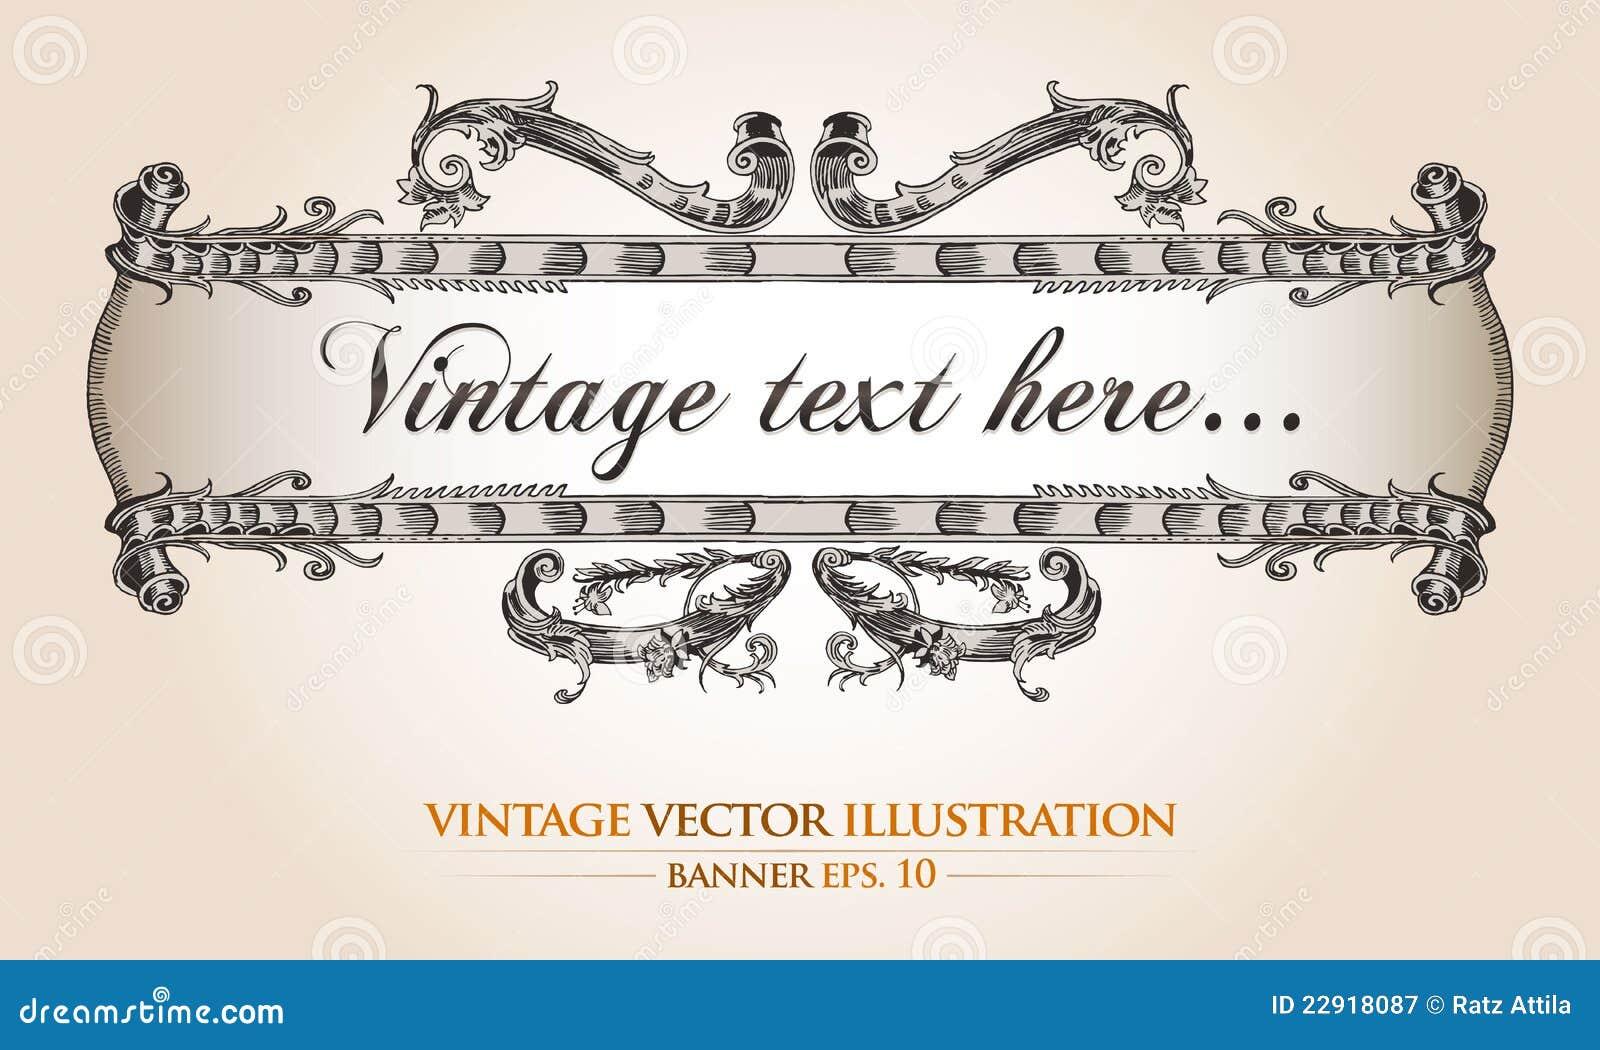 vintage banner template stock vector. illustration of heraldic, Powerpoint templates